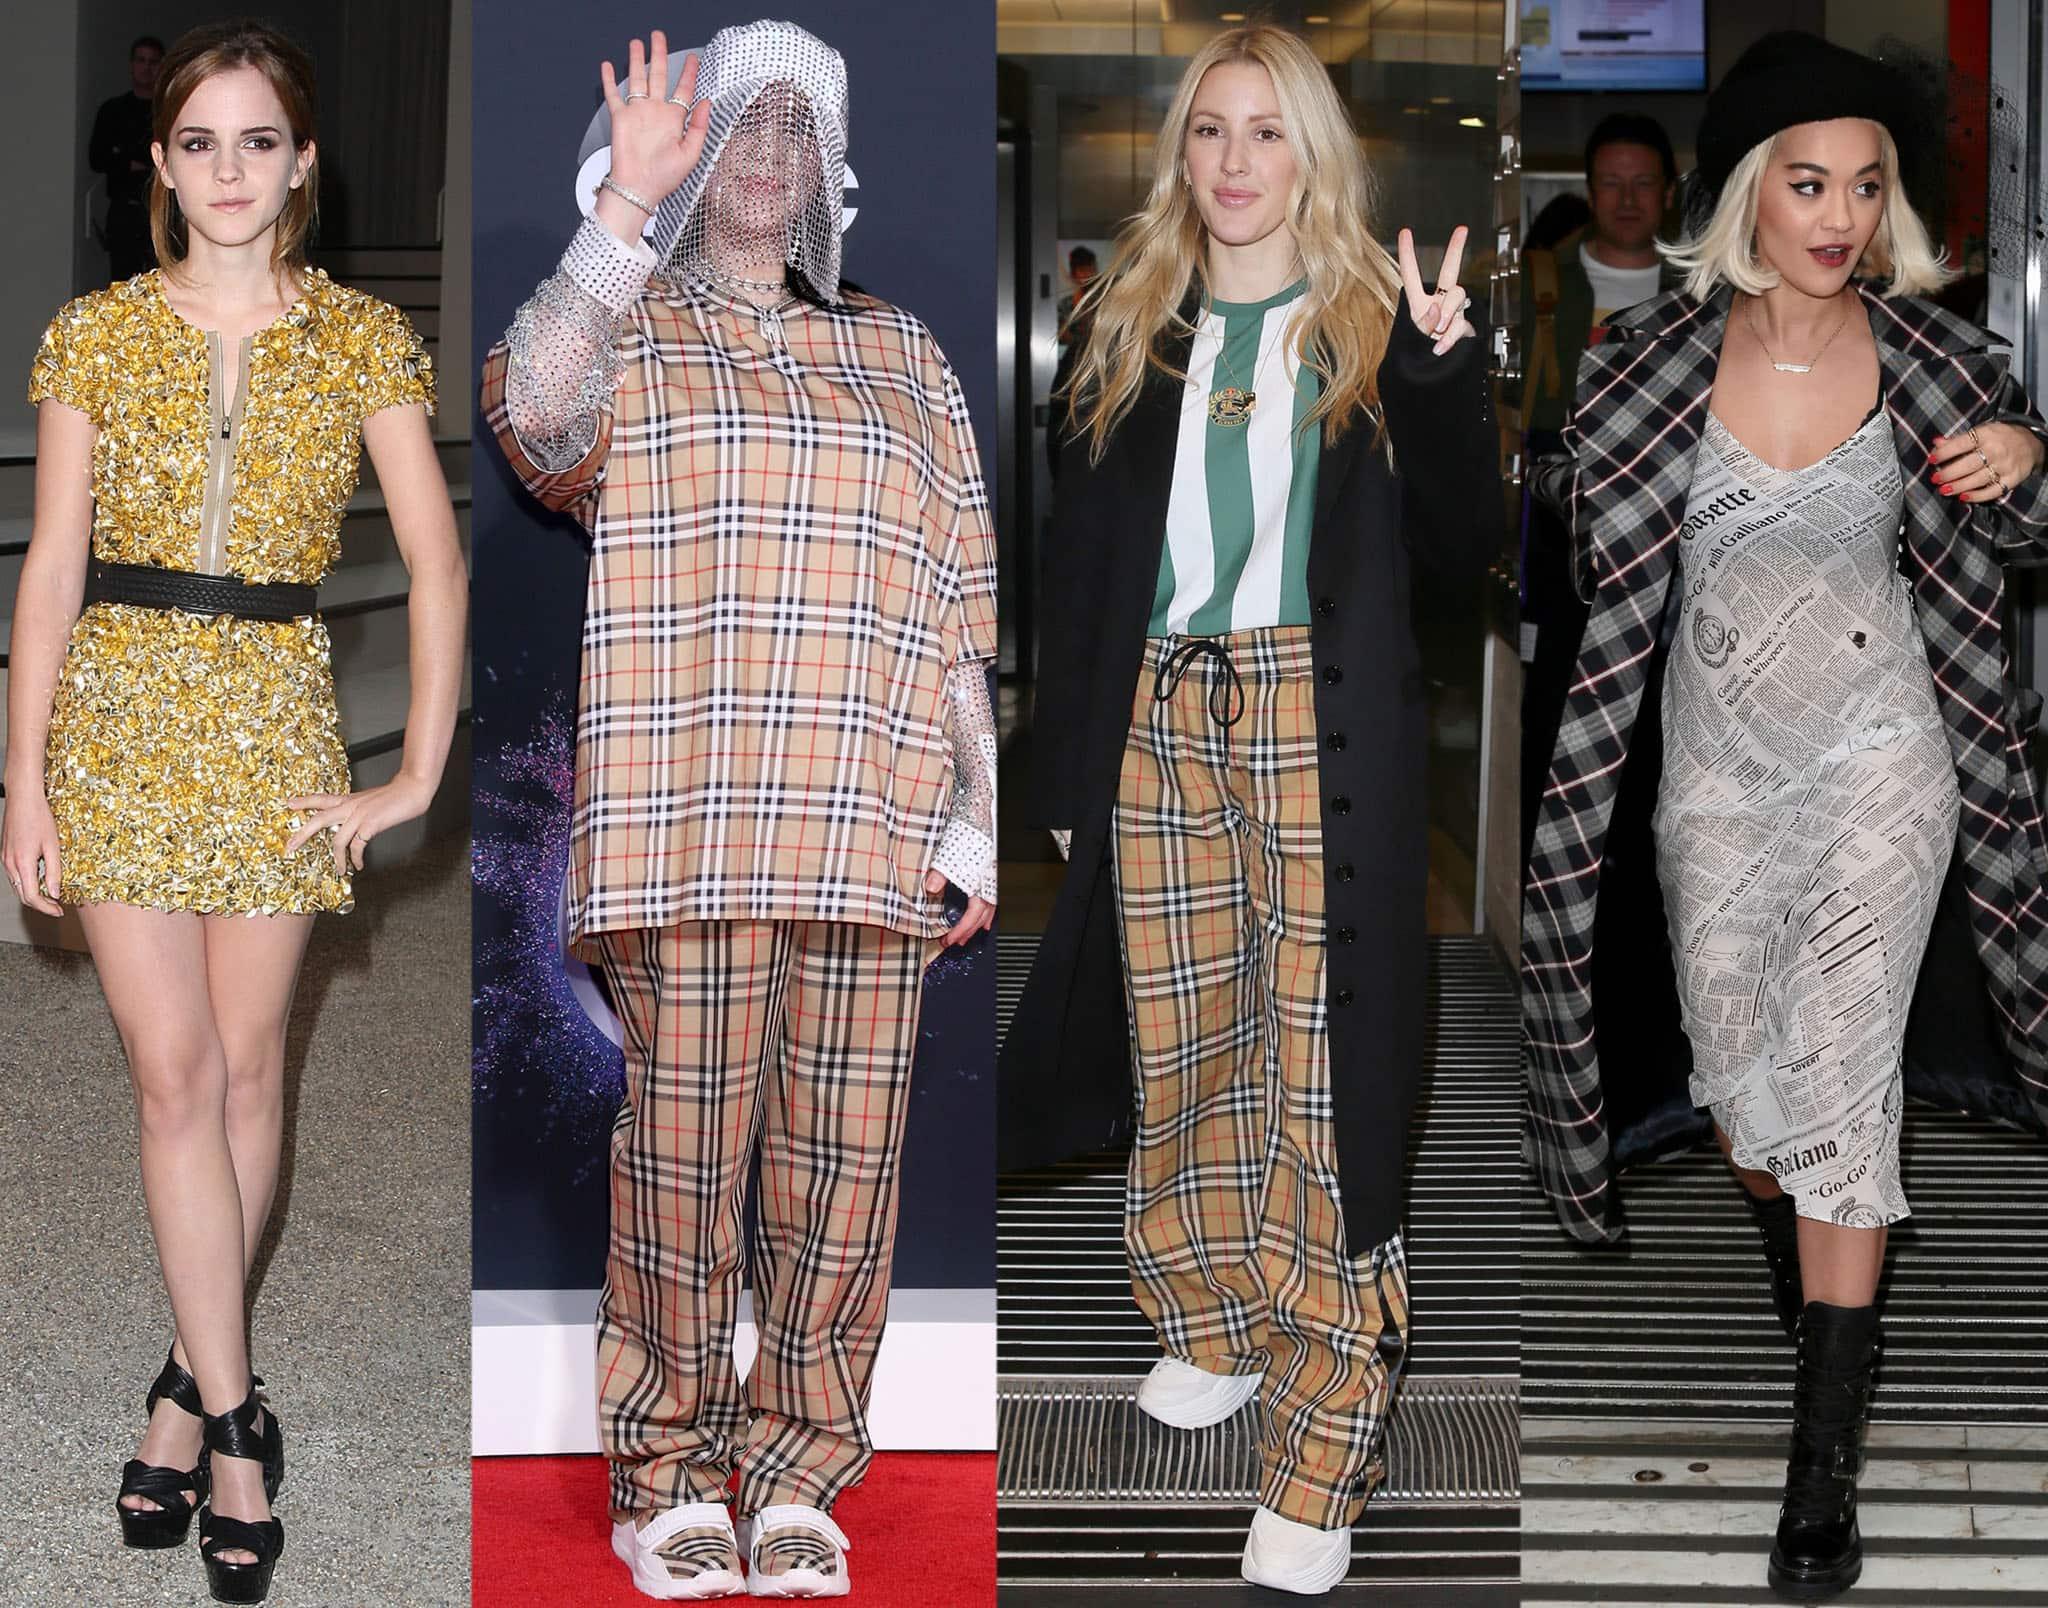 Emma Watson, Billie Eilish, Ellie Goulding, and Rita Ora wearing Burberry